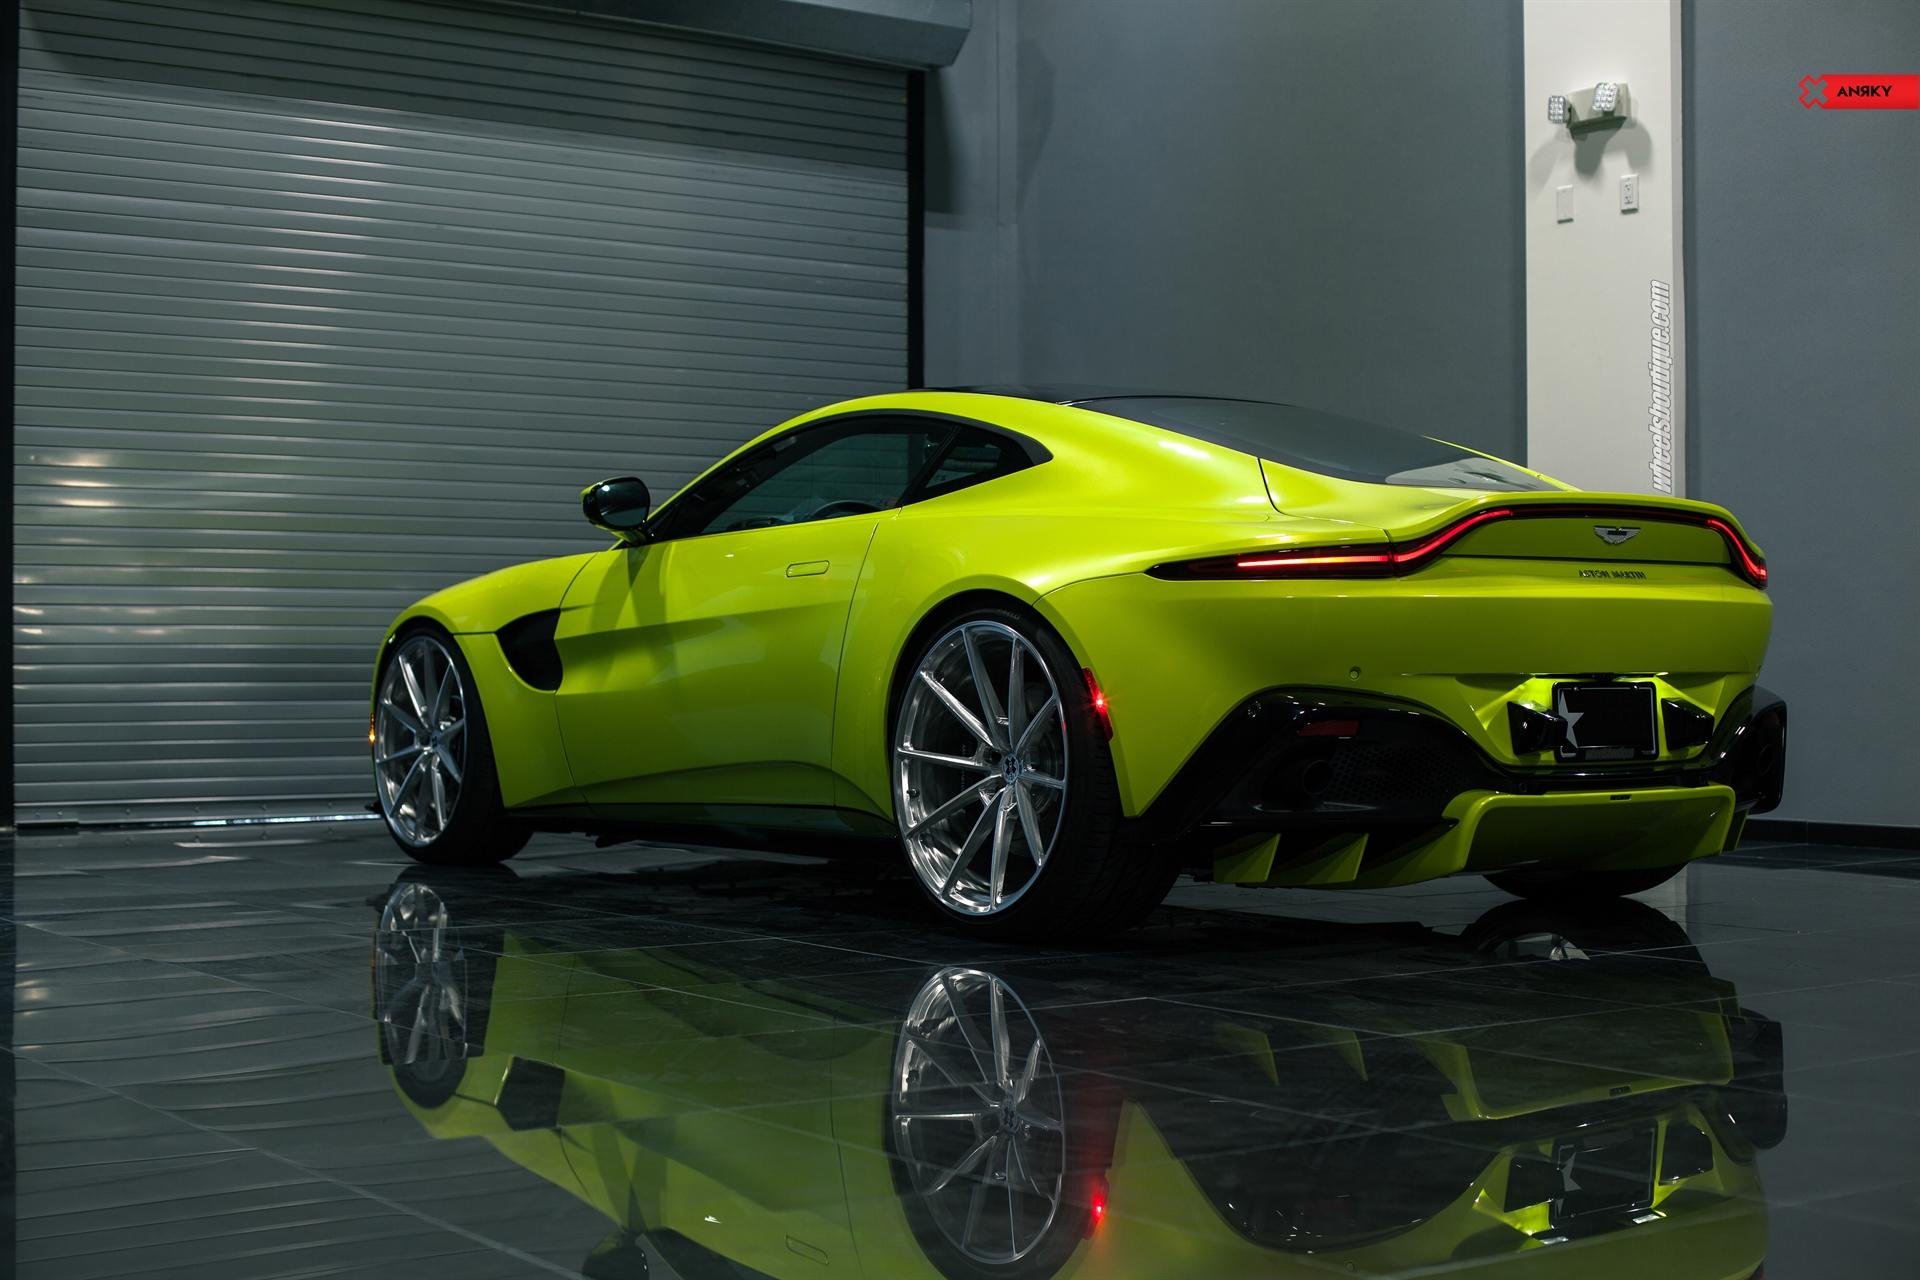 Aston Martin Vantage (2019) on ANRKY AN18 Gallery | Wheels ...